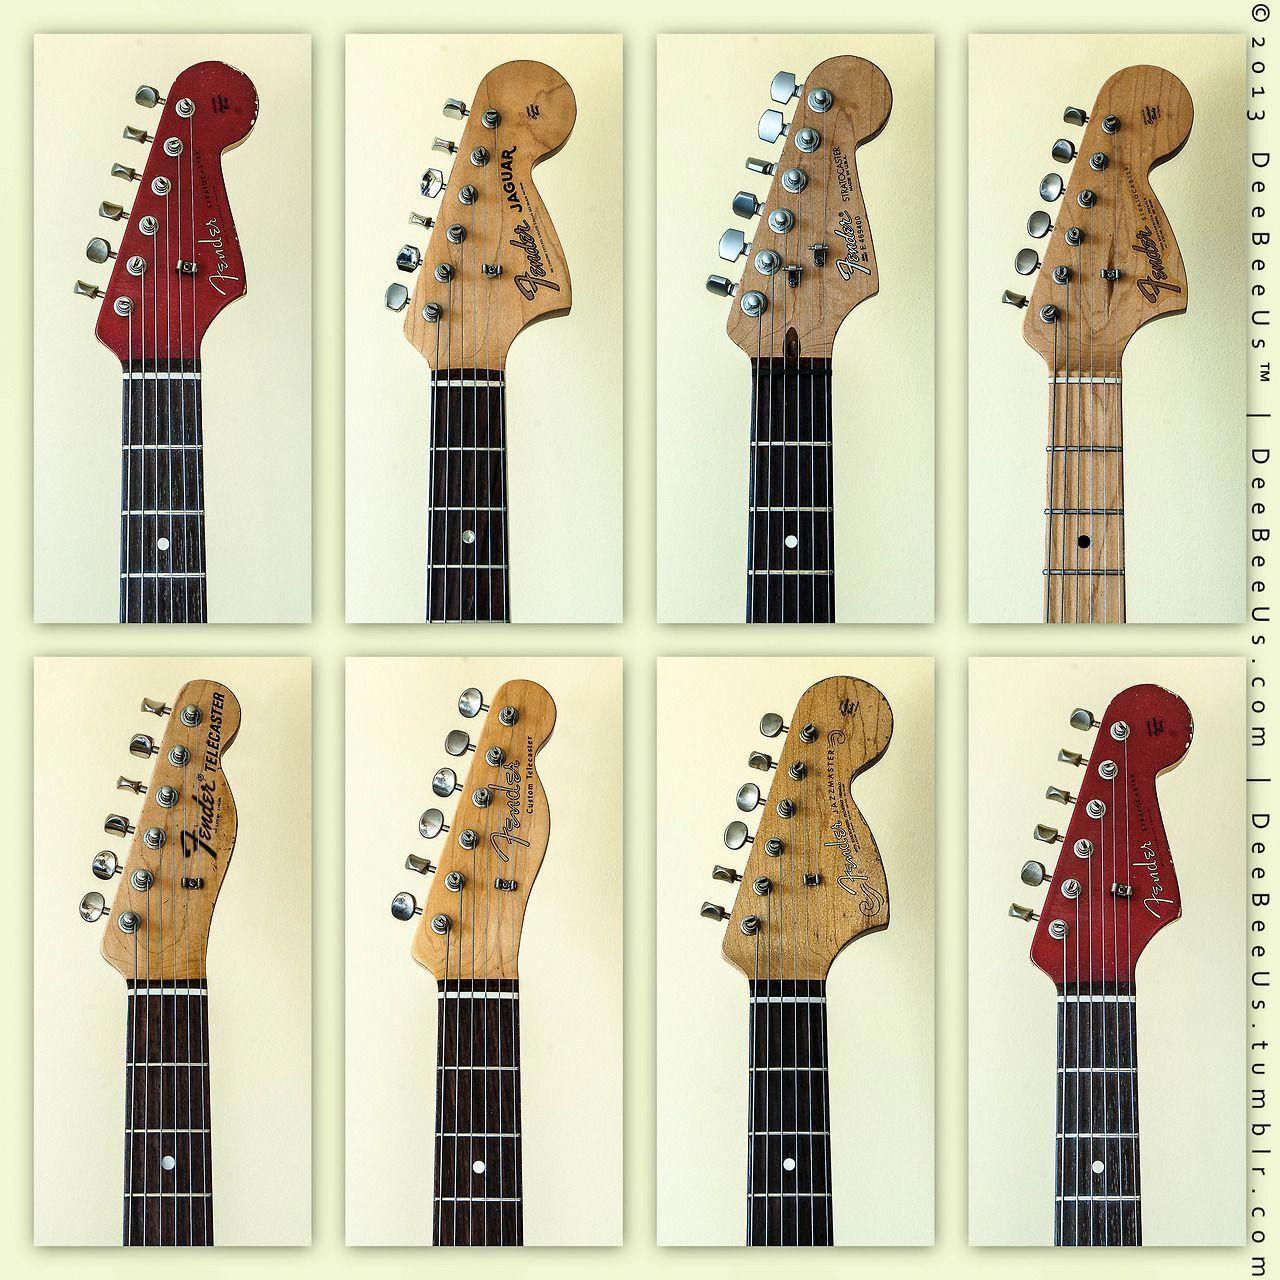 Fender Guitar Neck Telecaster Fender Guitar Jack Nut #guitarshop #guitarcover #fenderguitars #fenderguitars